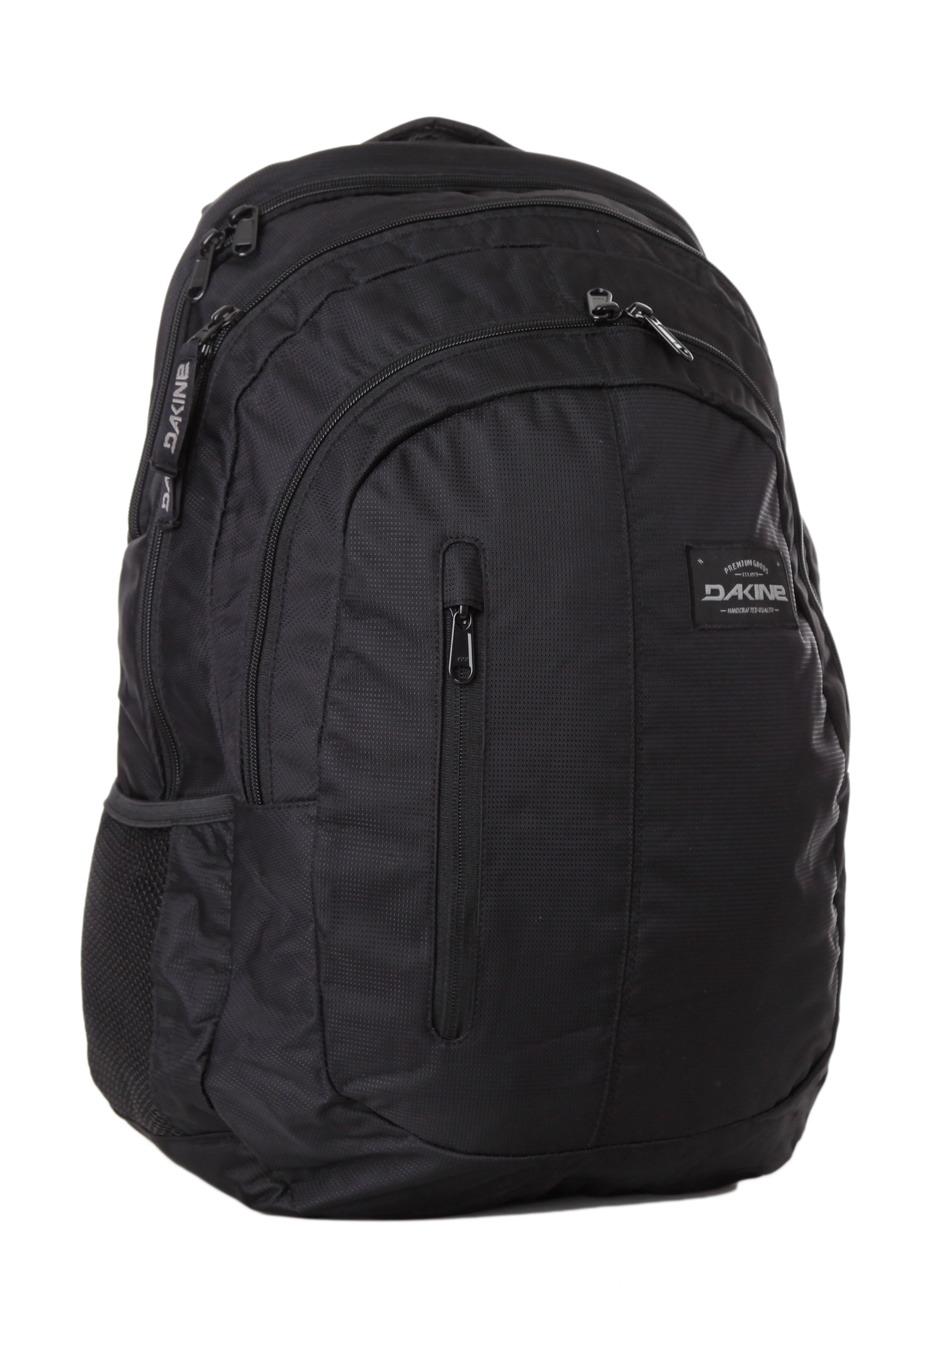 Dakine - Foundation - Backpack - Impericon.com Worldwide